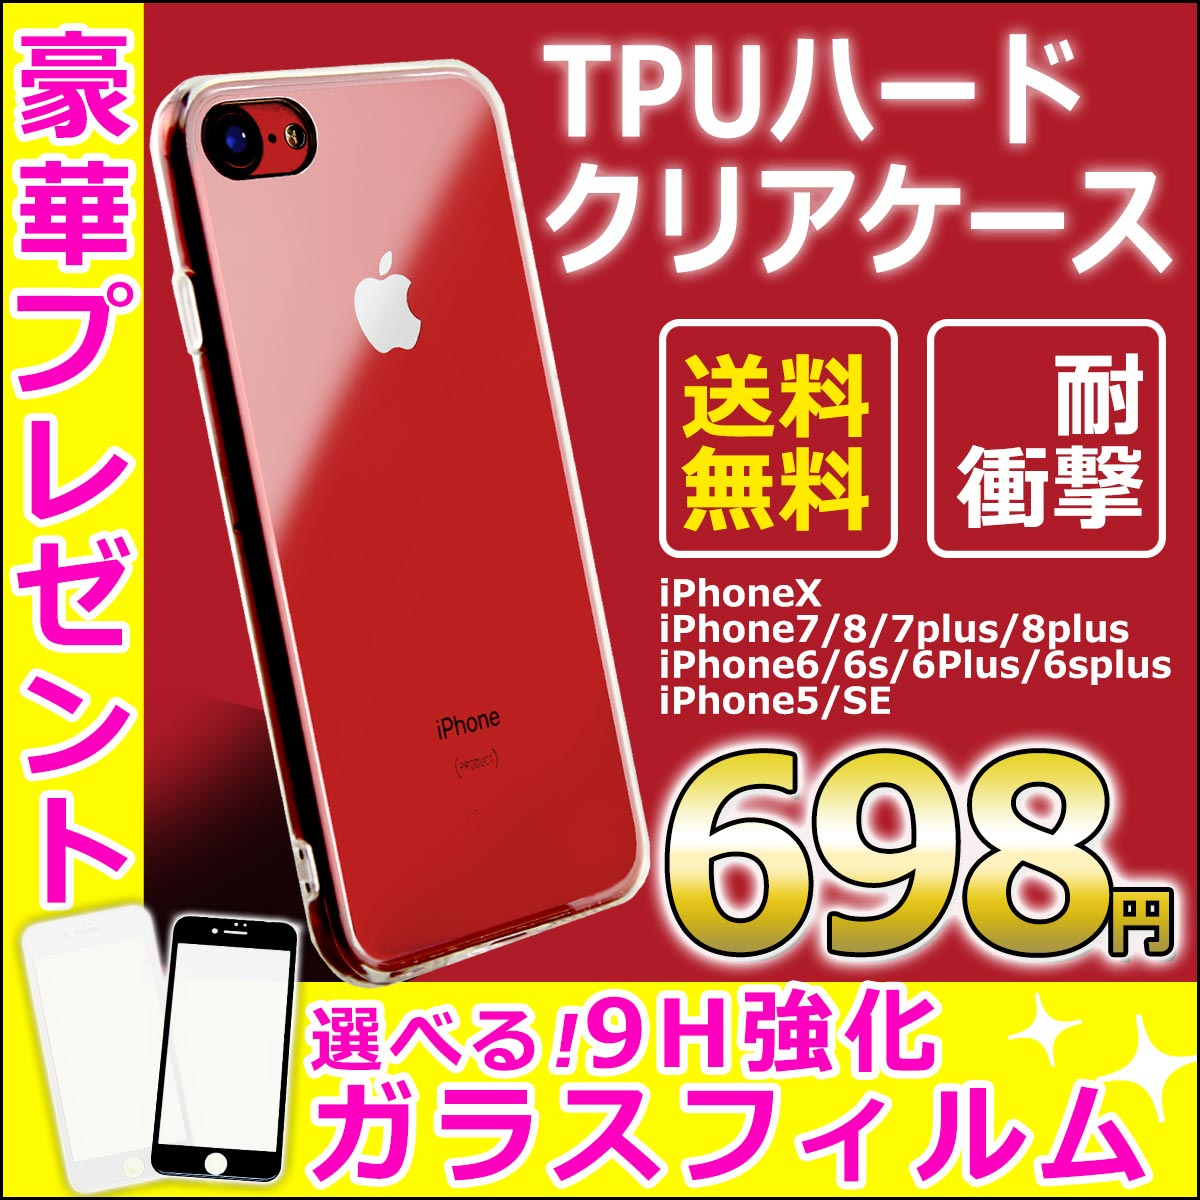 iphone7ケース iphone8 iPhone se【耐衝撃】tpu+pc【超クリア ケース】 【送料無料】 iPhone6 Plus